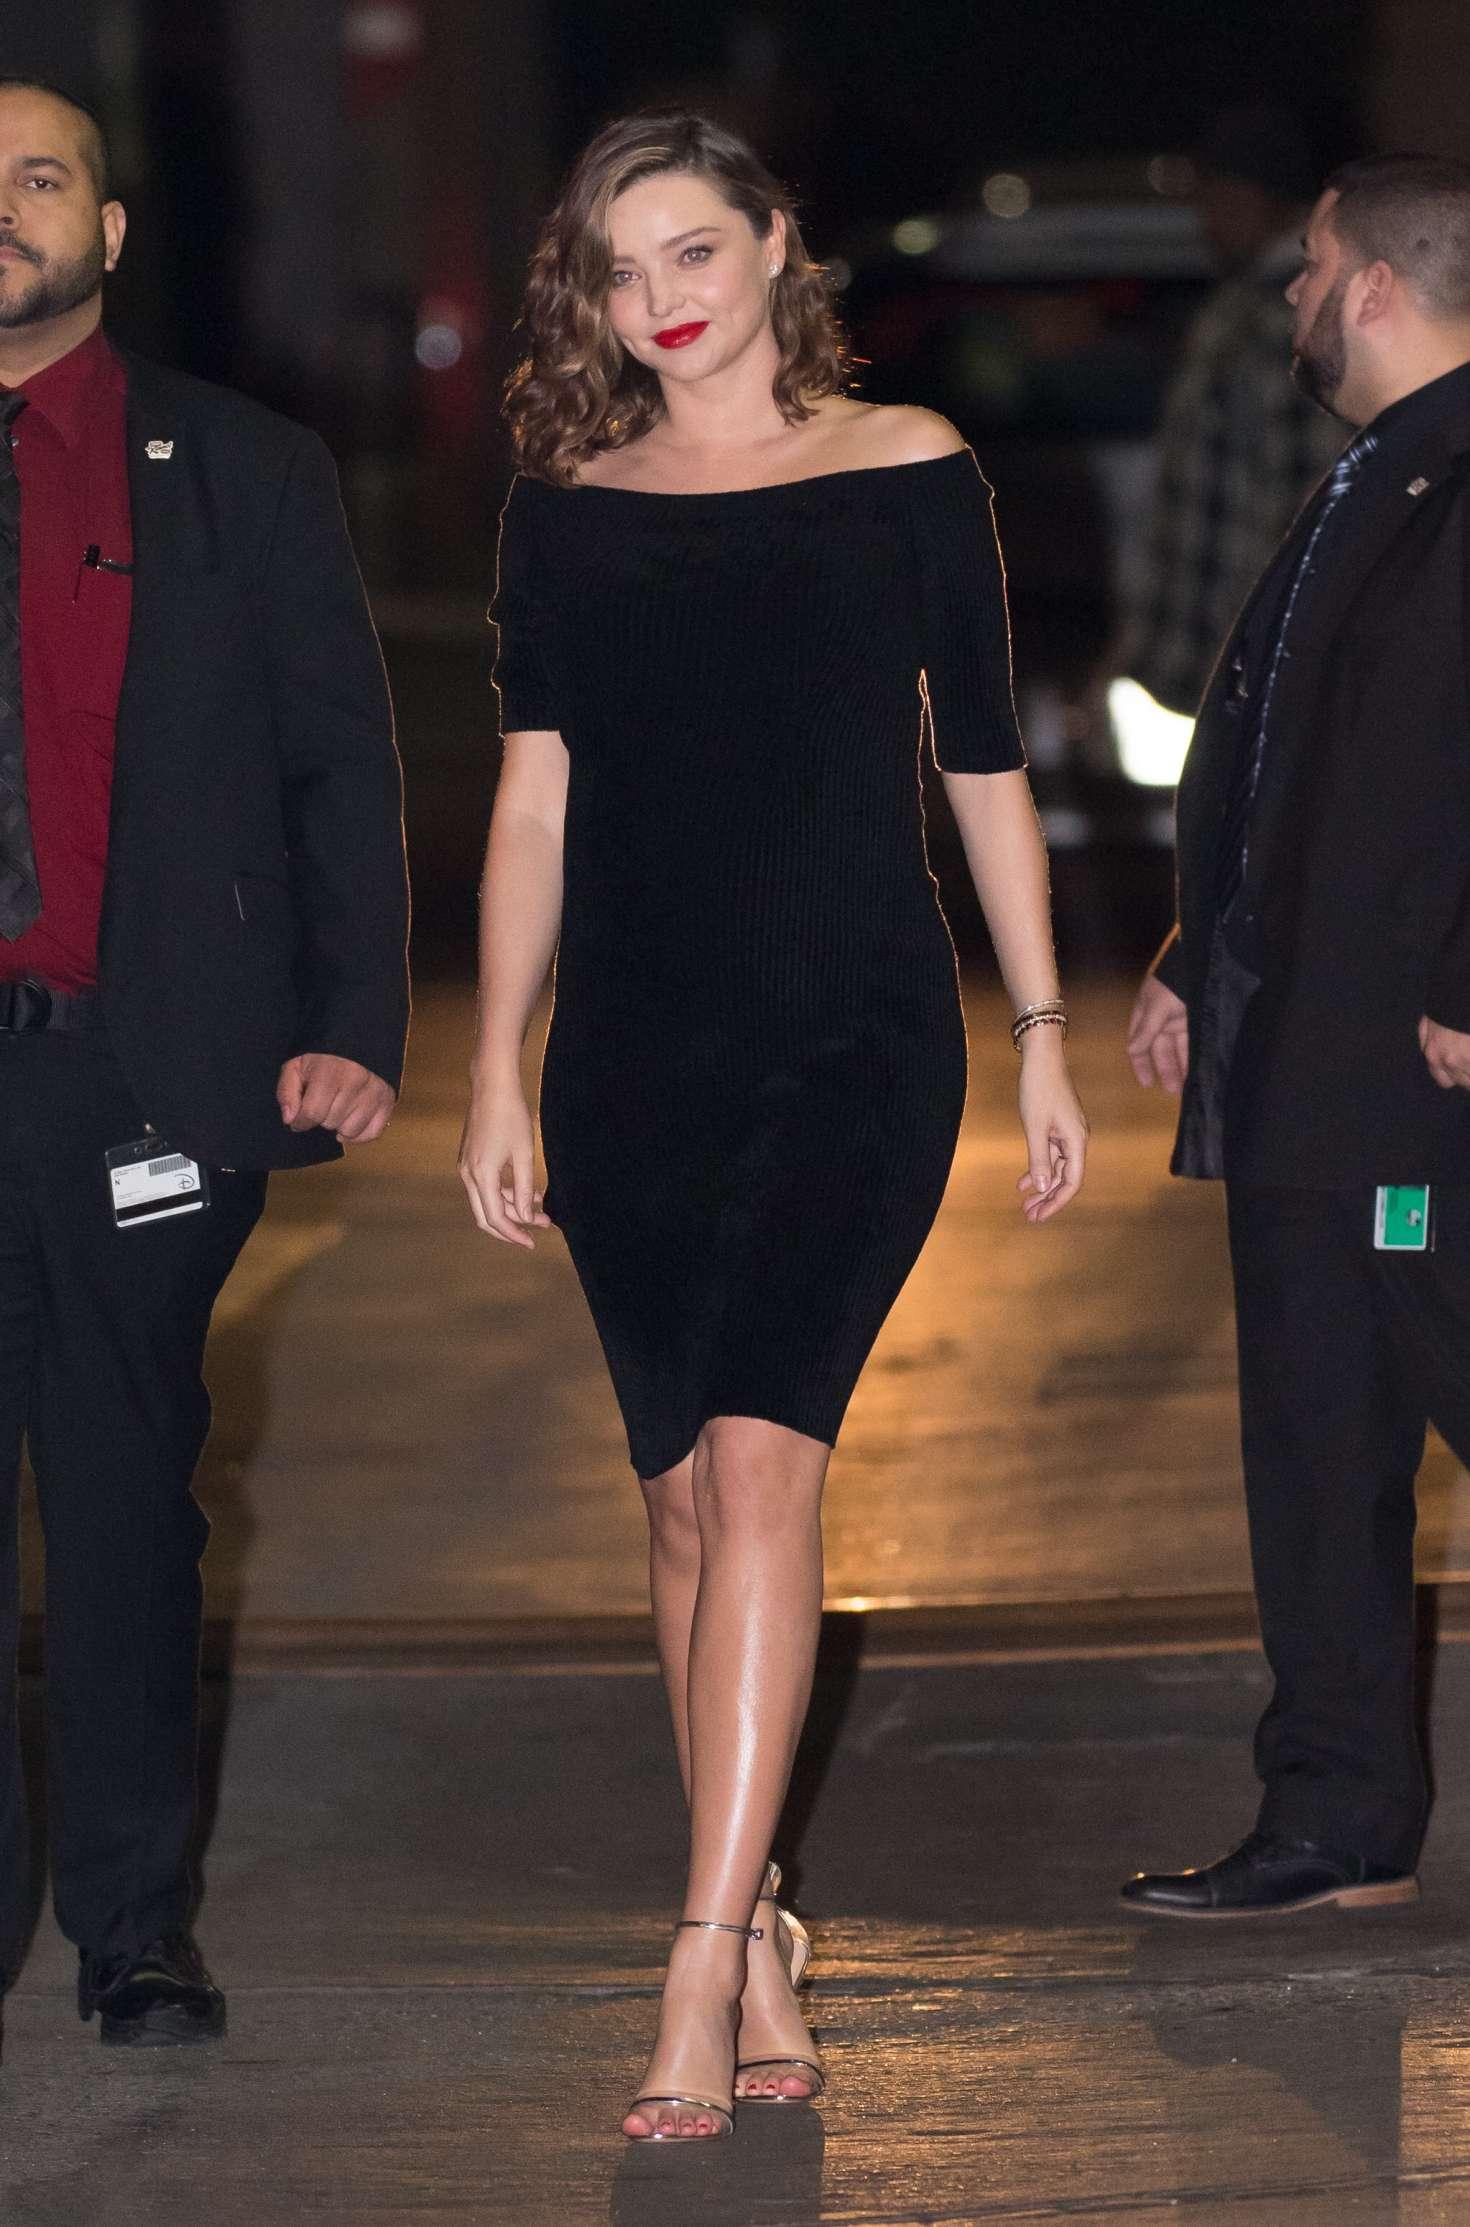 Miranda Kerr 2018 : Miranda Kerr: Leaves at Jimmy Kimmel Live -11